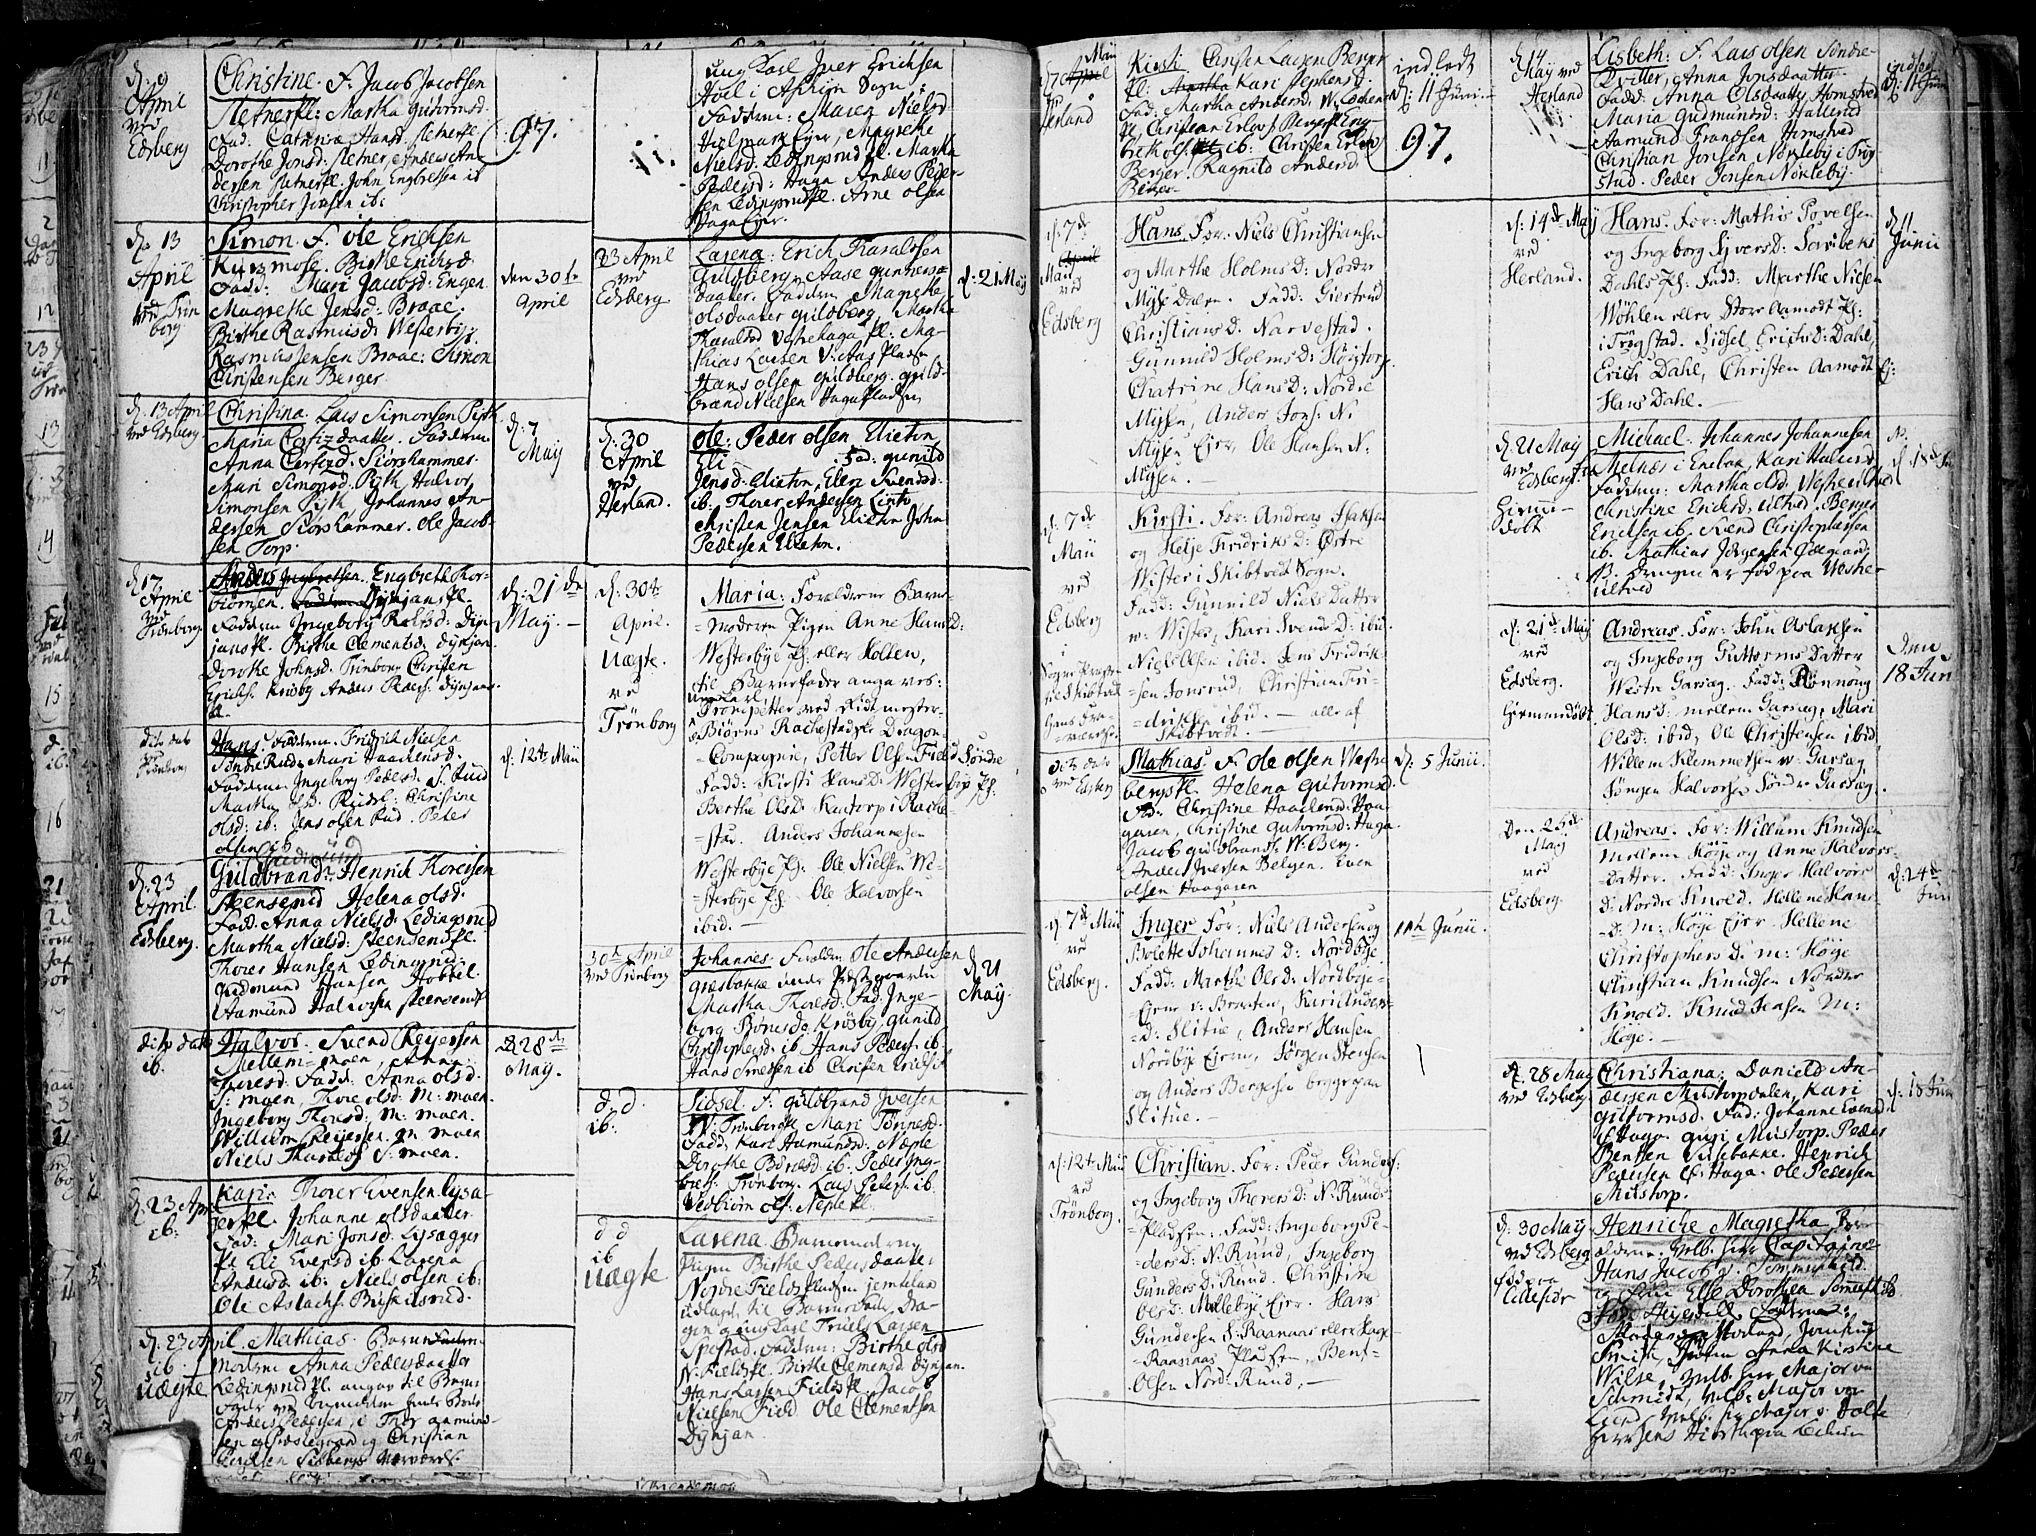 SAO, Eidsberg prestekontor Kirkebøker, F/Fa/L0005: Ministerialbok nr. I 5, 1786-1807, s. 41